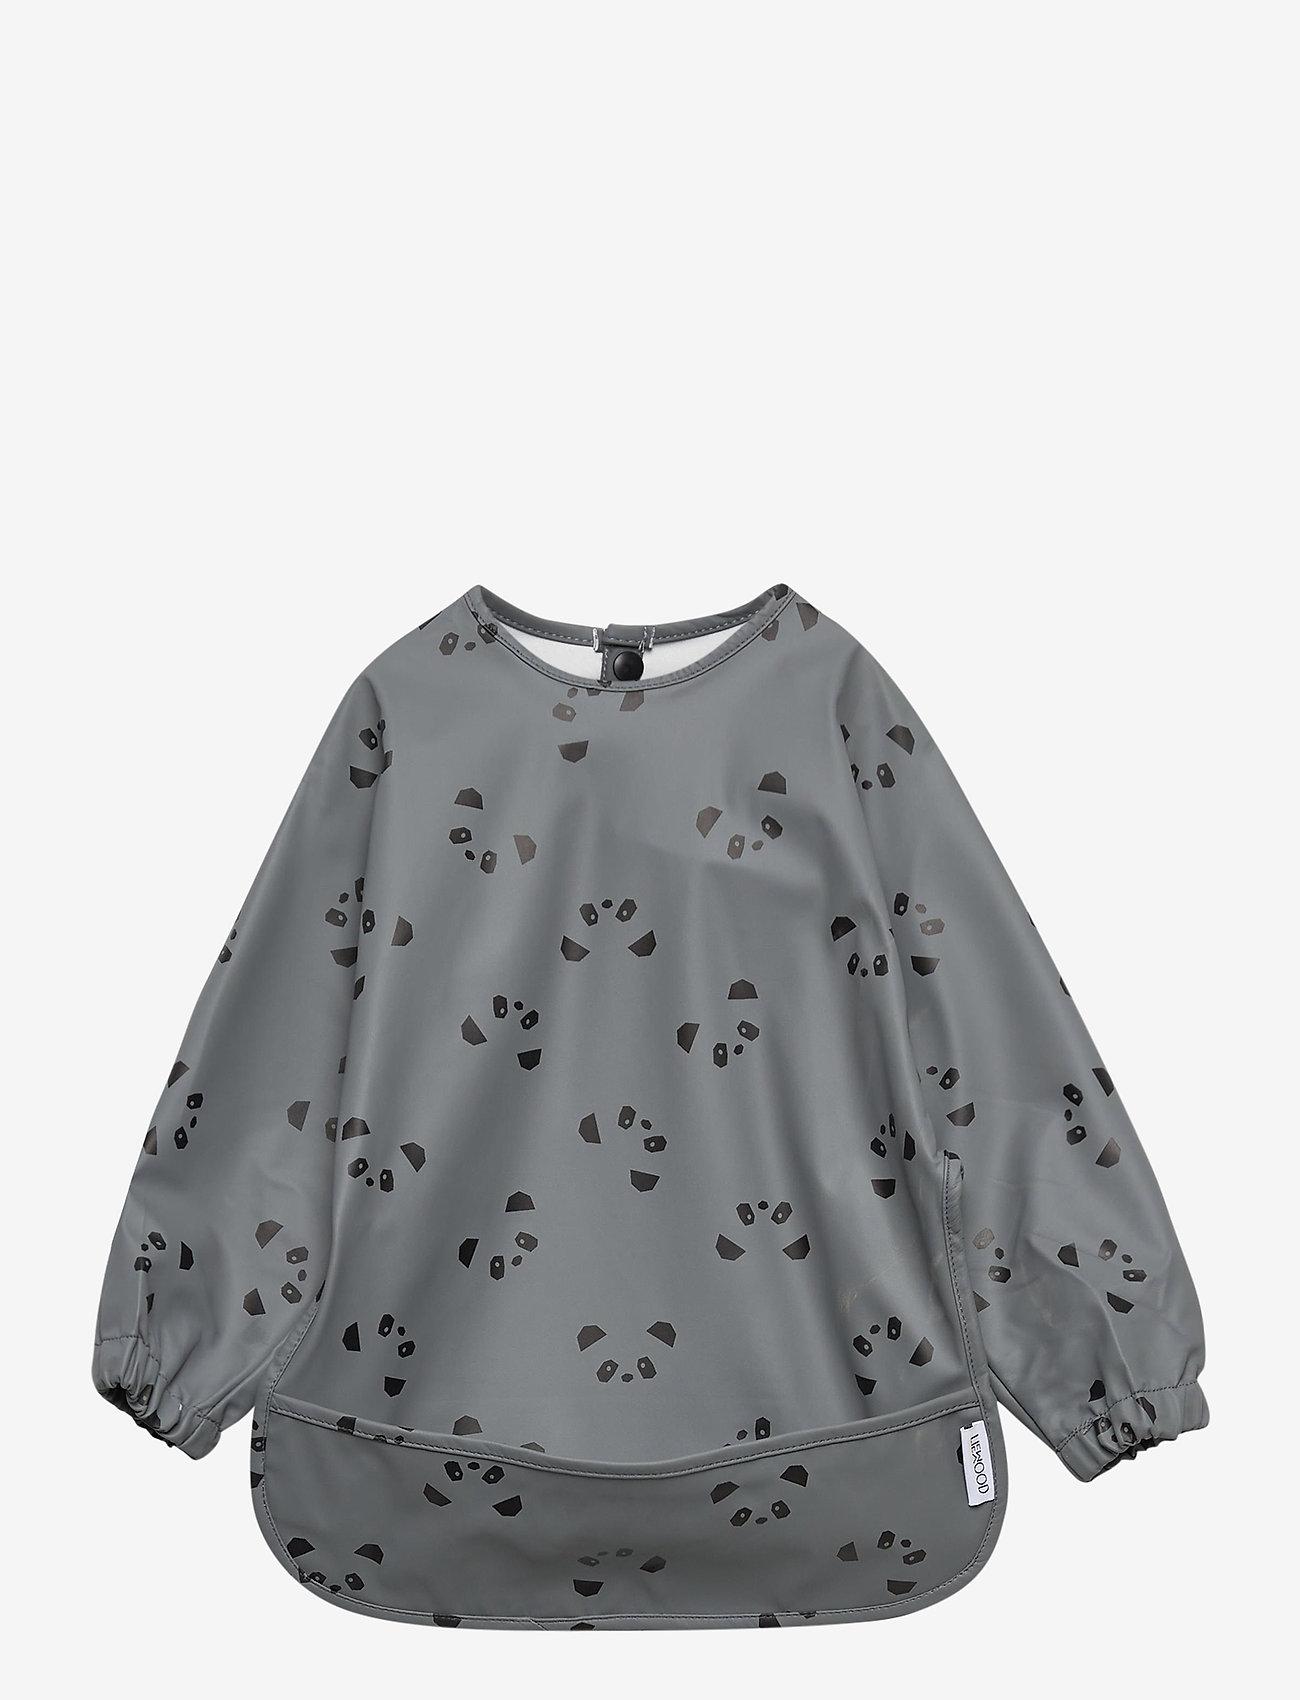 Liewood - Merle cape bib print - 2 pack - Śliniaczek - panda stone grey - 0